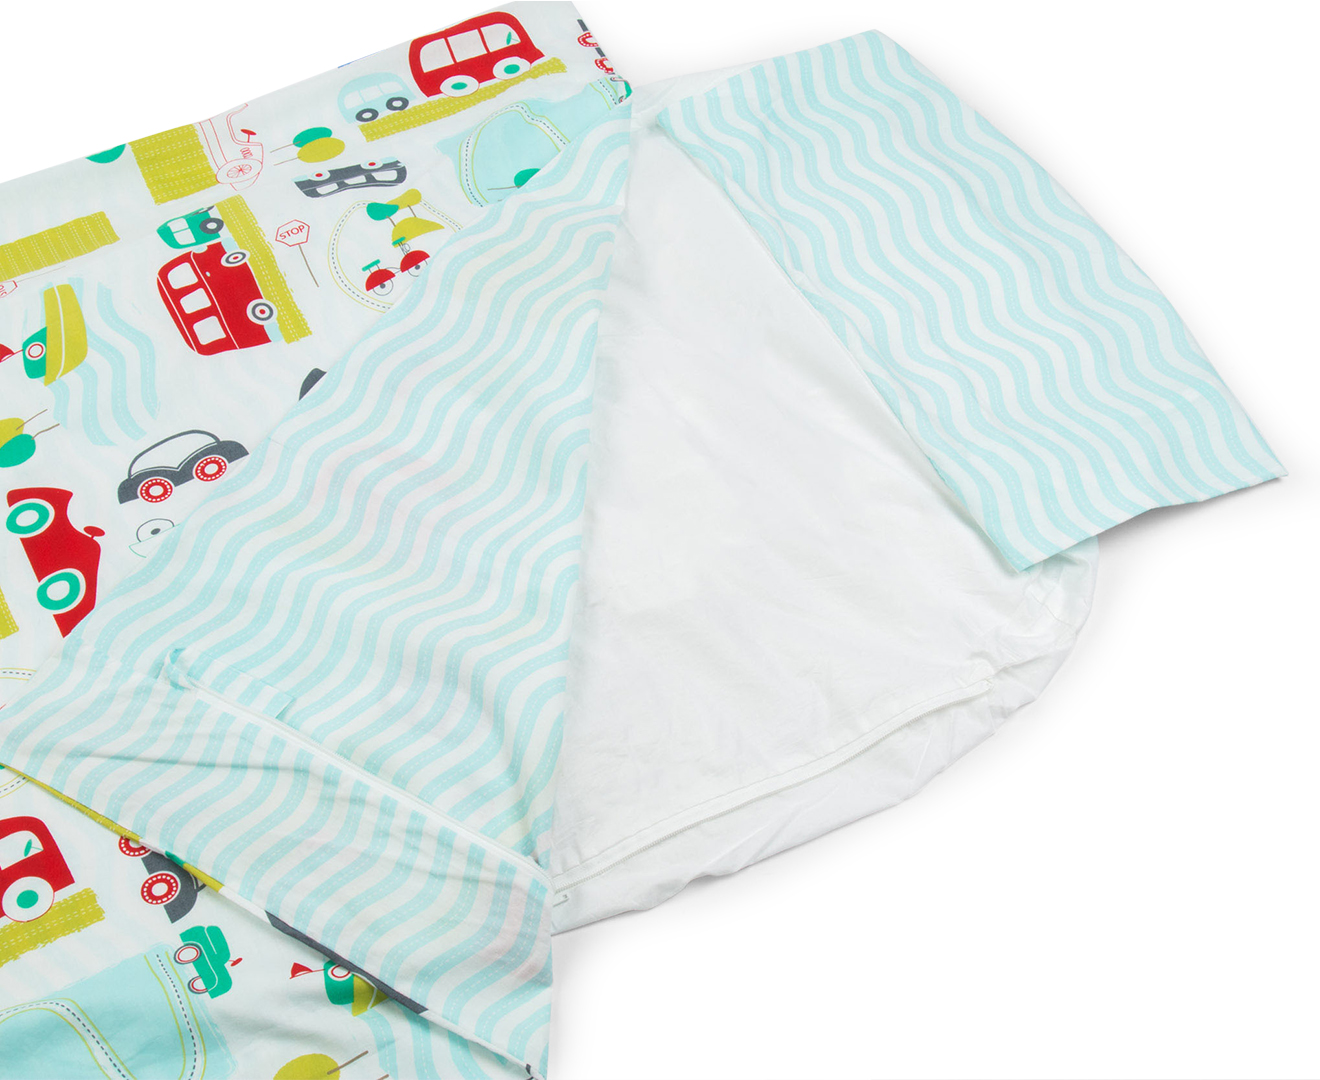 Gro To Bed All Aboard Unique Zip In Bedding Set Junior